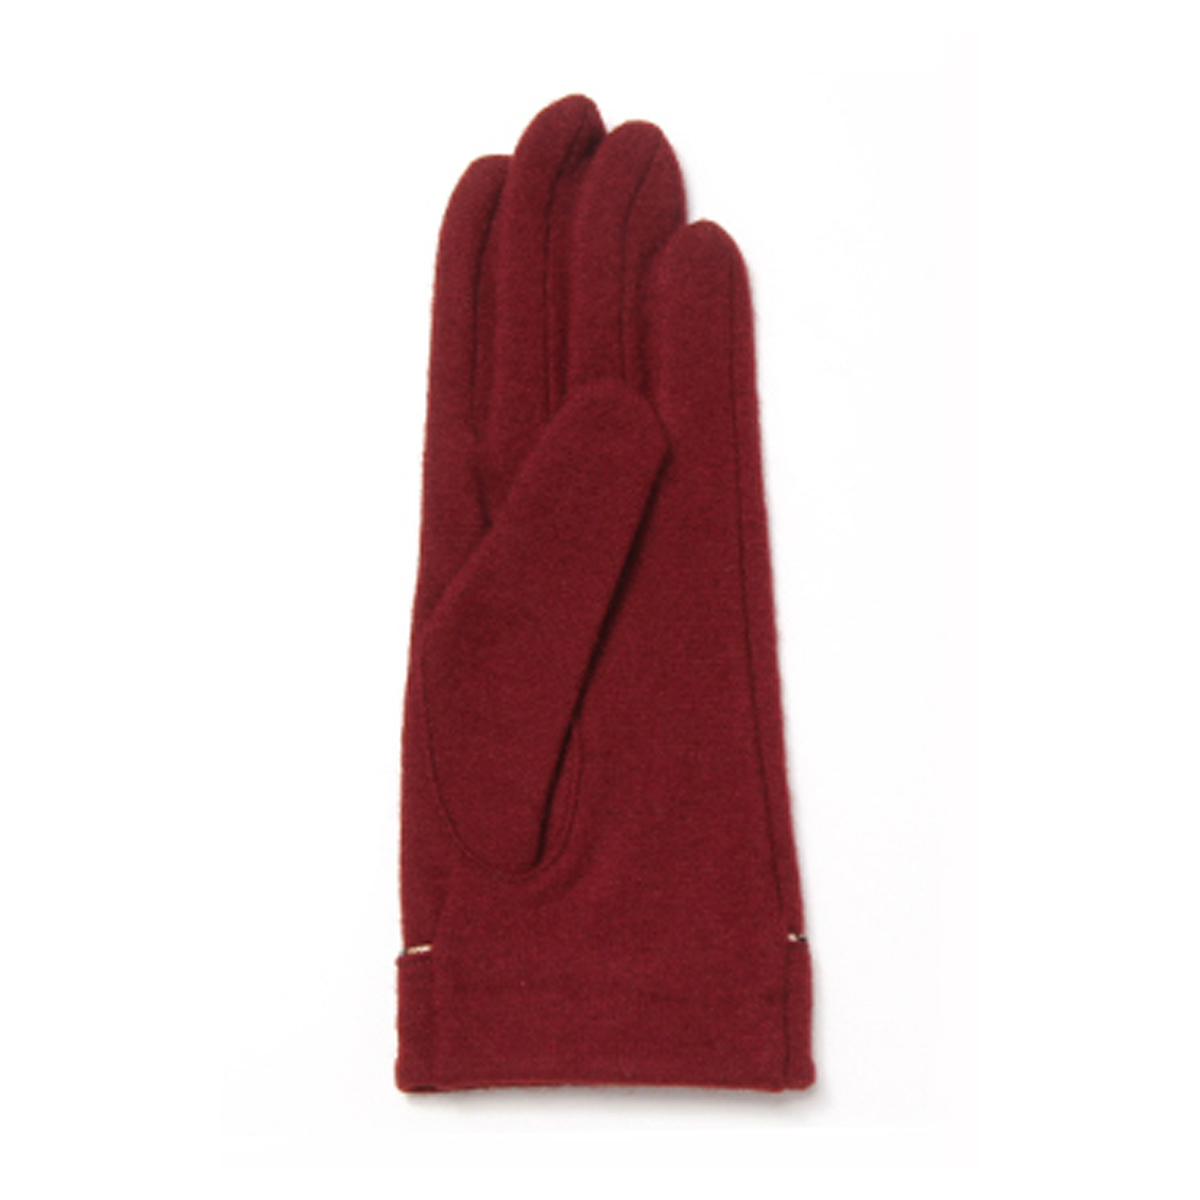 DAKS ロゴ刺繍 ハウスチェックコードパイピング カシミヤ混ジャージ レディース手袋 日本製 Mサイズ 全4色